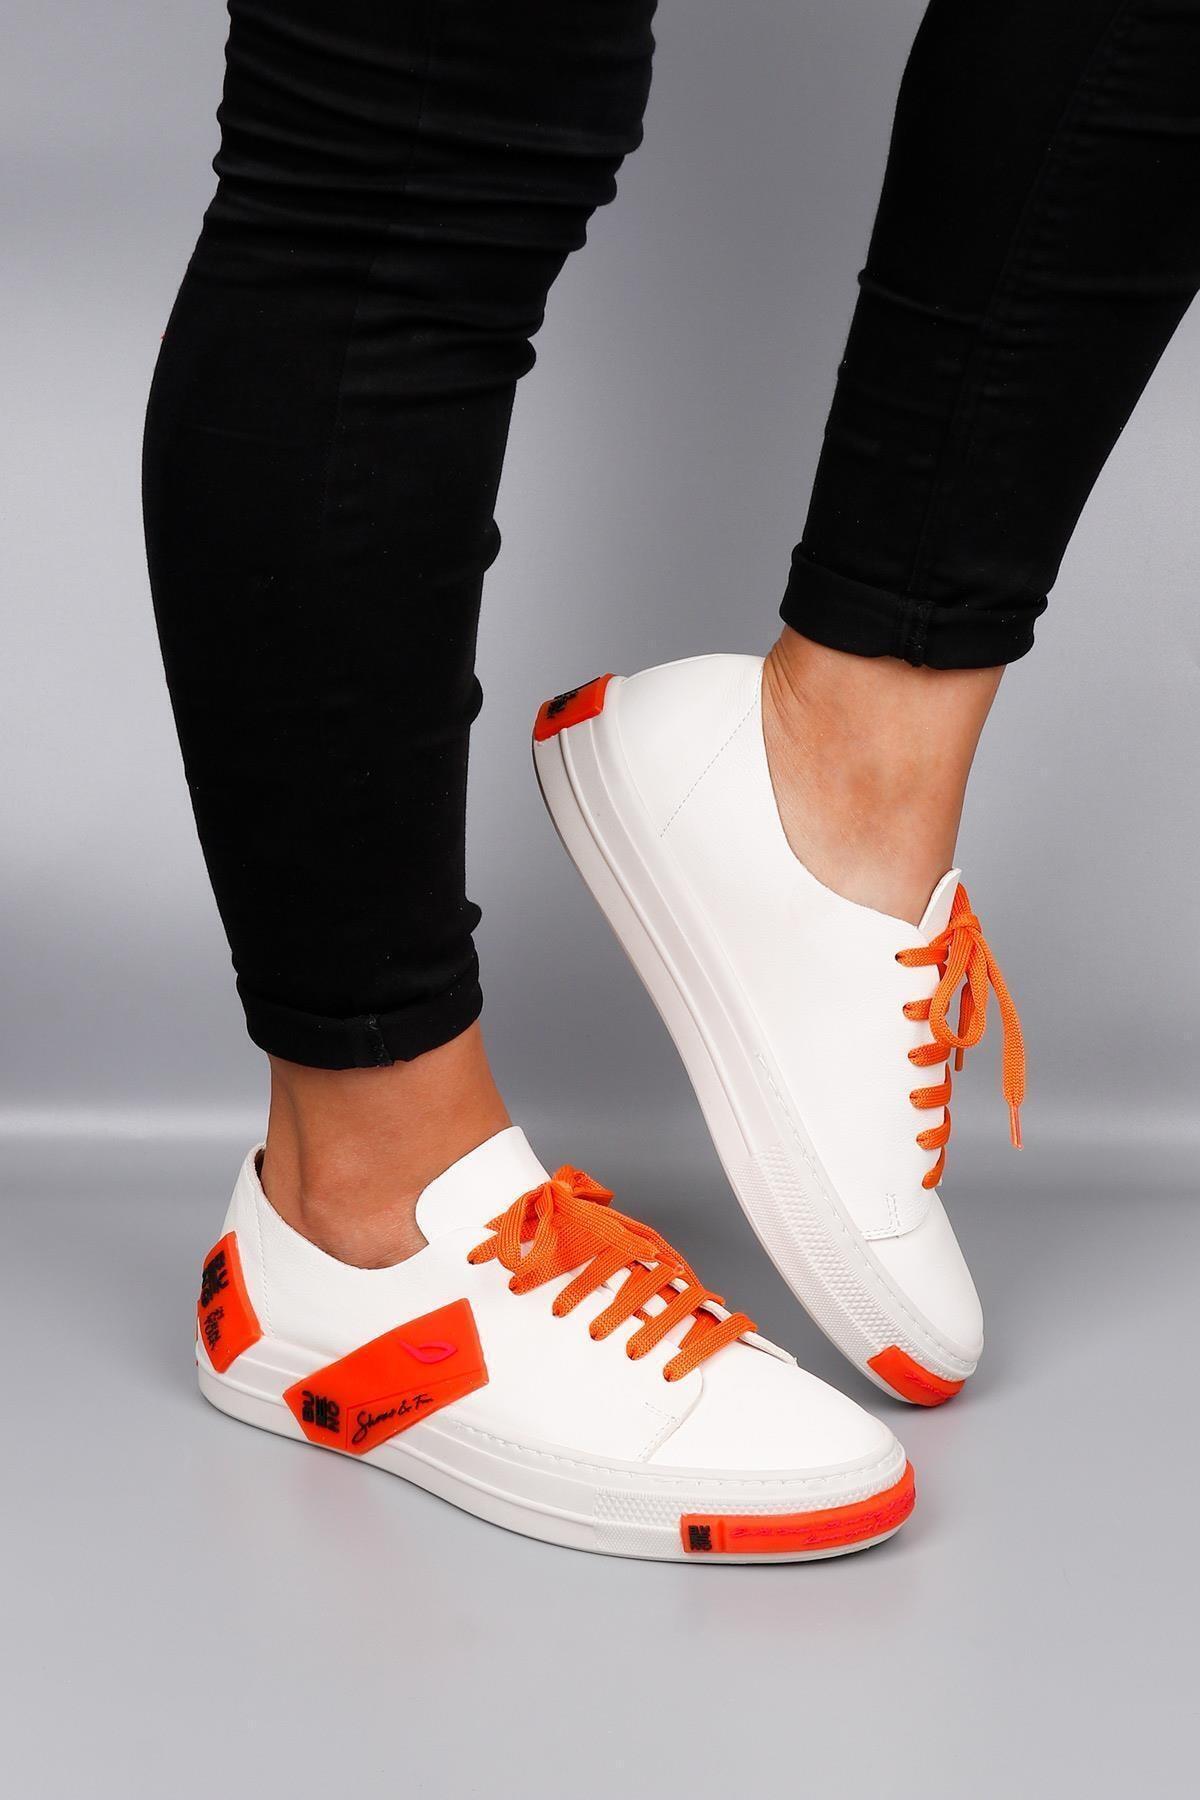 BUENO Shoes Kadın Spor 20wq10900 1